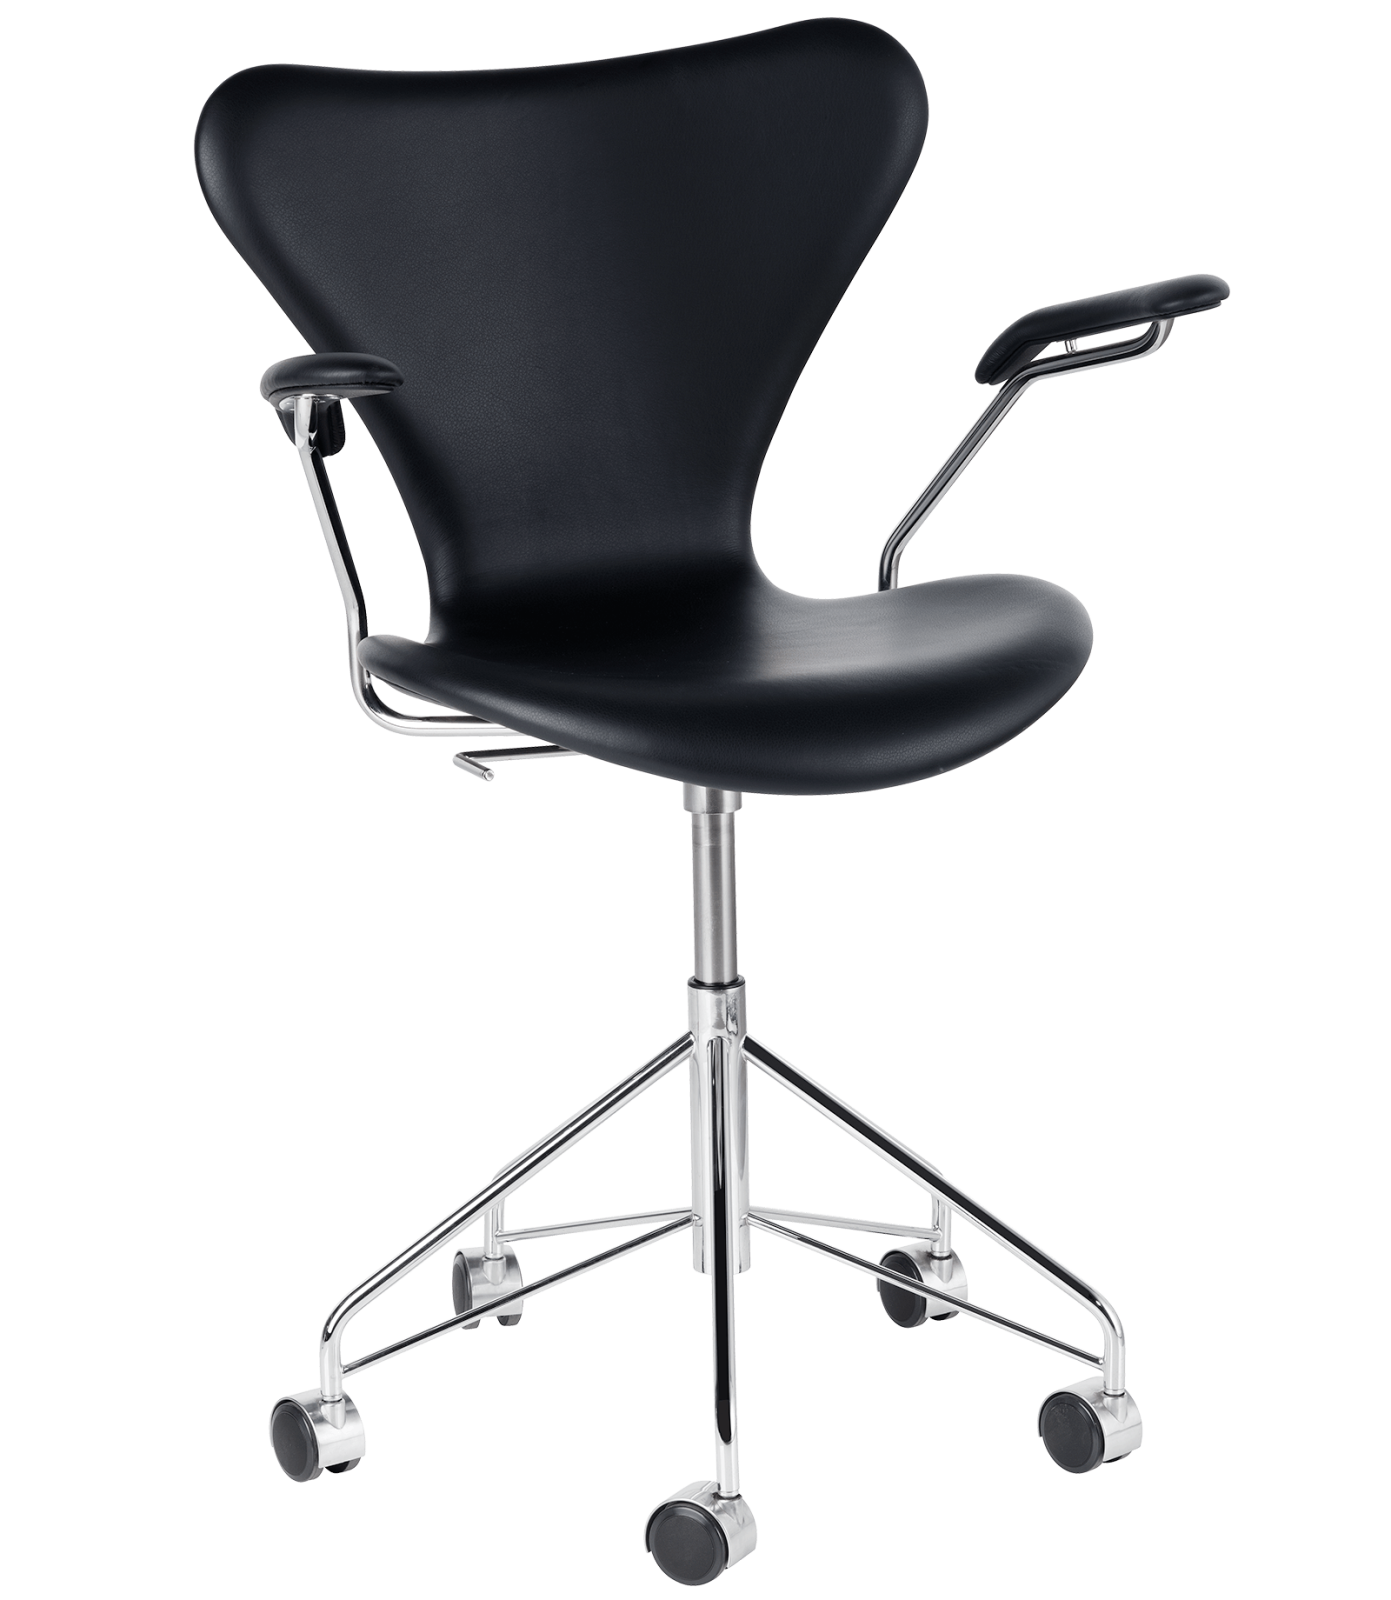 Series 7 Swivel Armchair - fully upholstered Elegance Leather Black